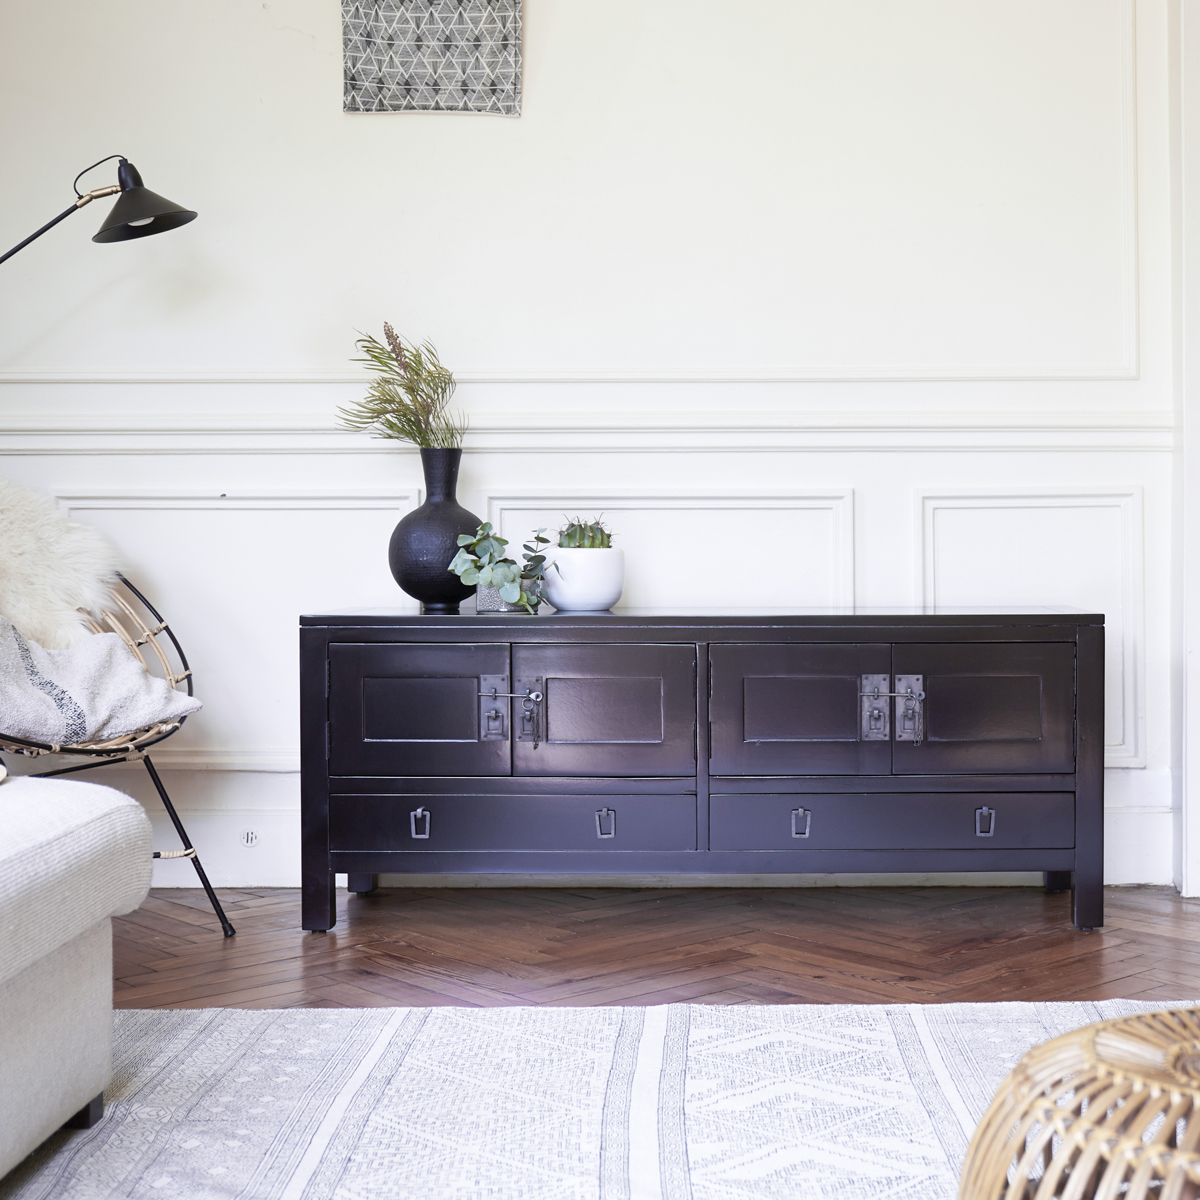 Thaki black mahogany TV Stand 140 cm